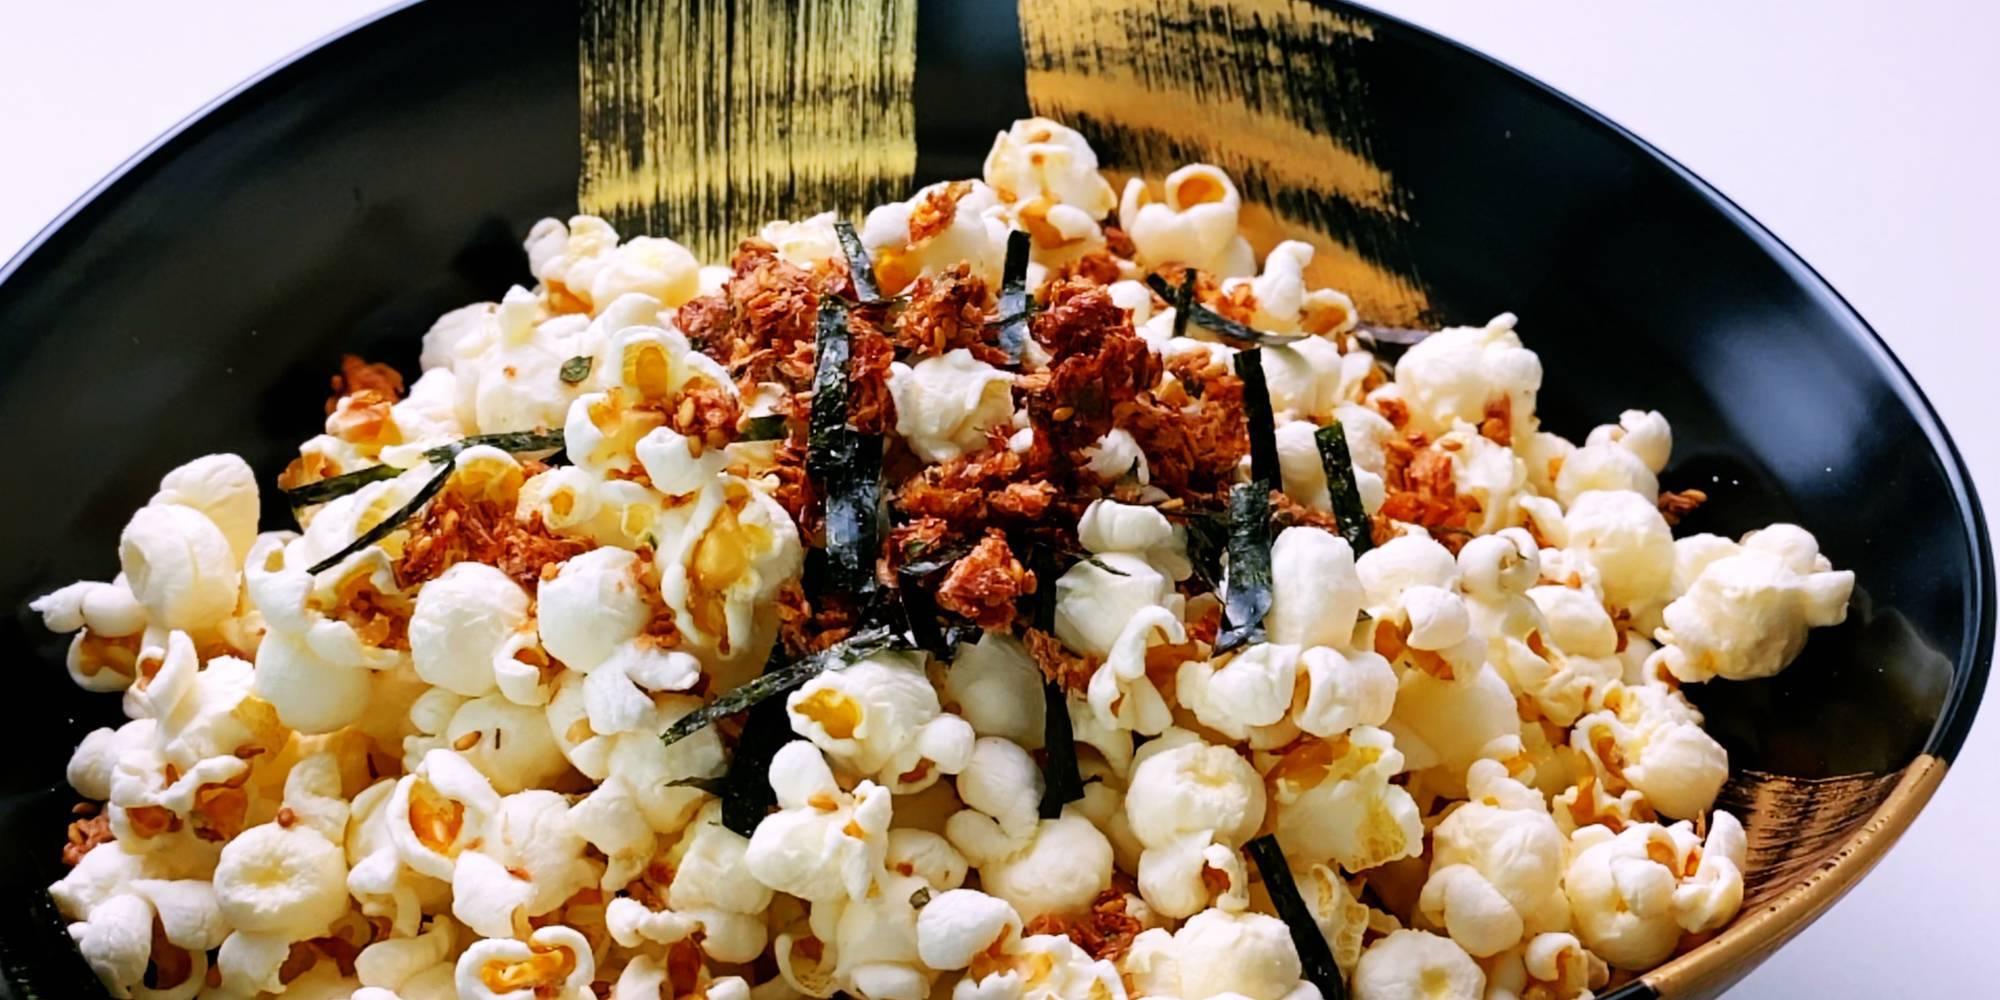 A bowl of popcorn sprinkled with Furikake seasoning.